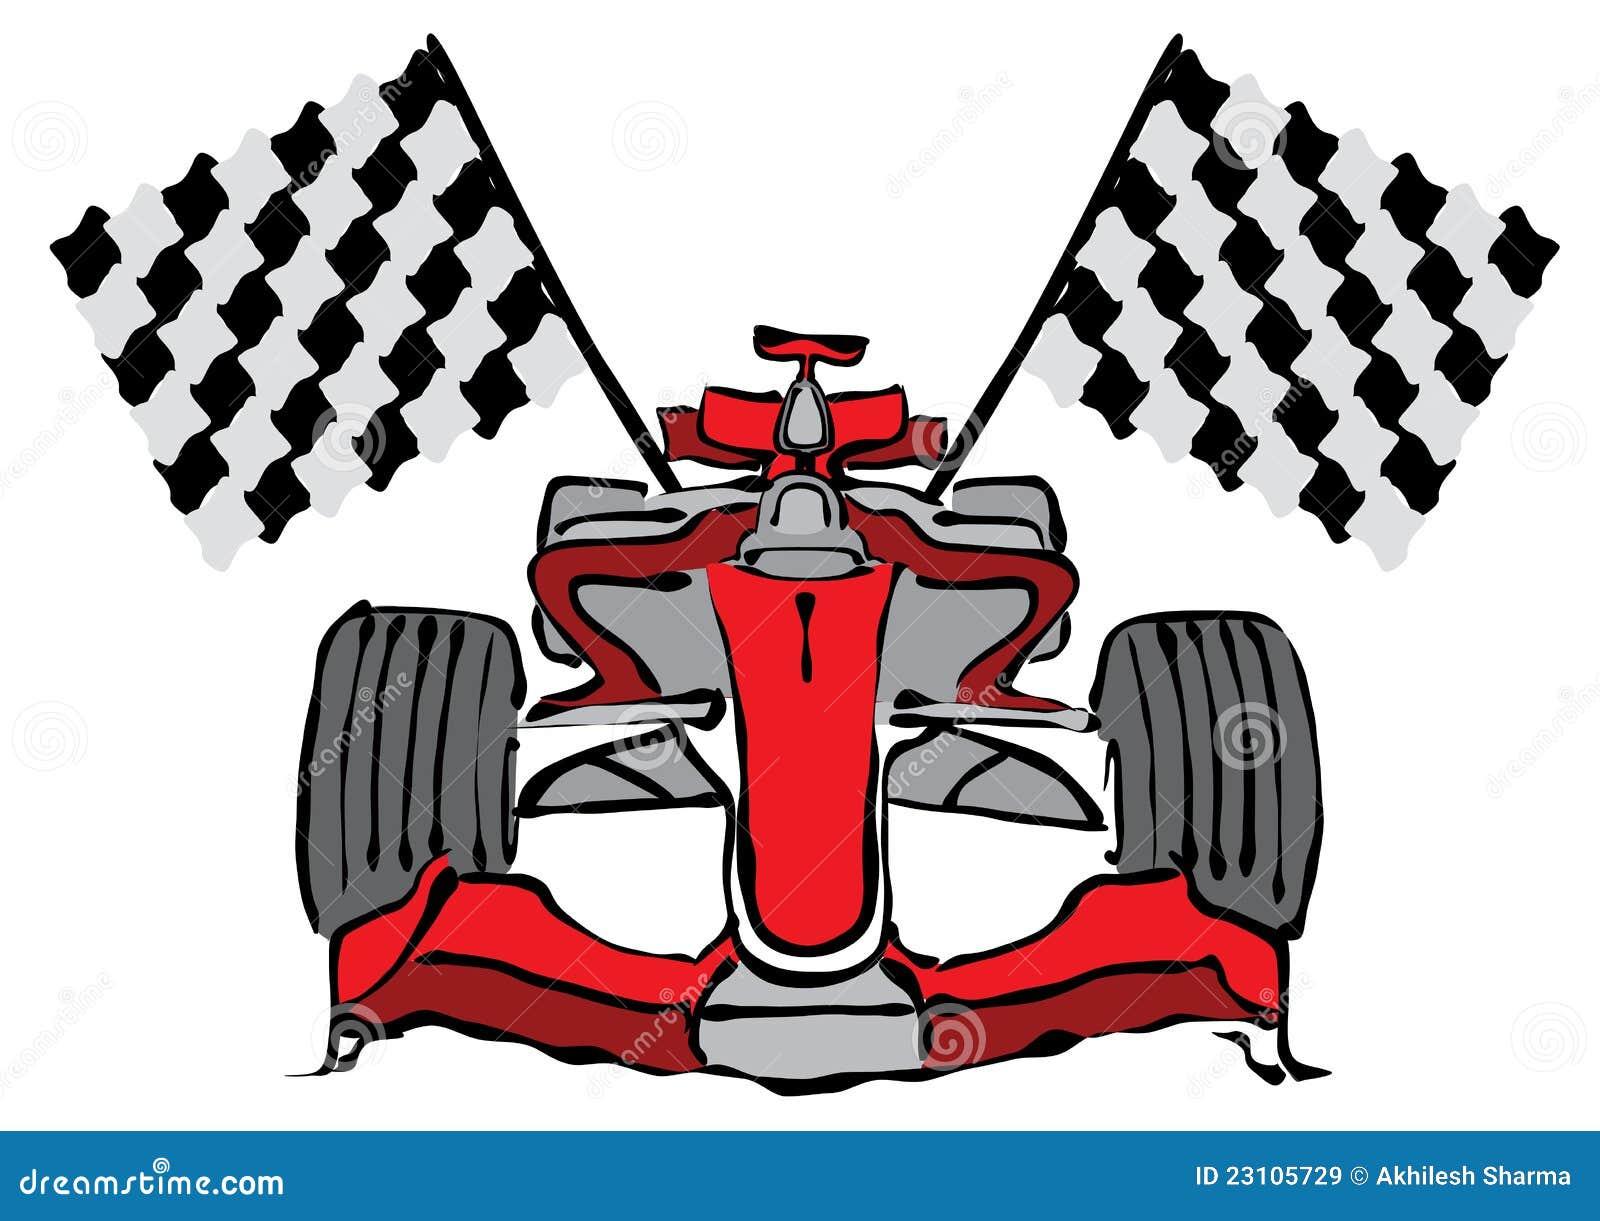 formula 1 images free  Formula 9 Racing Car Vector Stock Vector - Illustration of ...